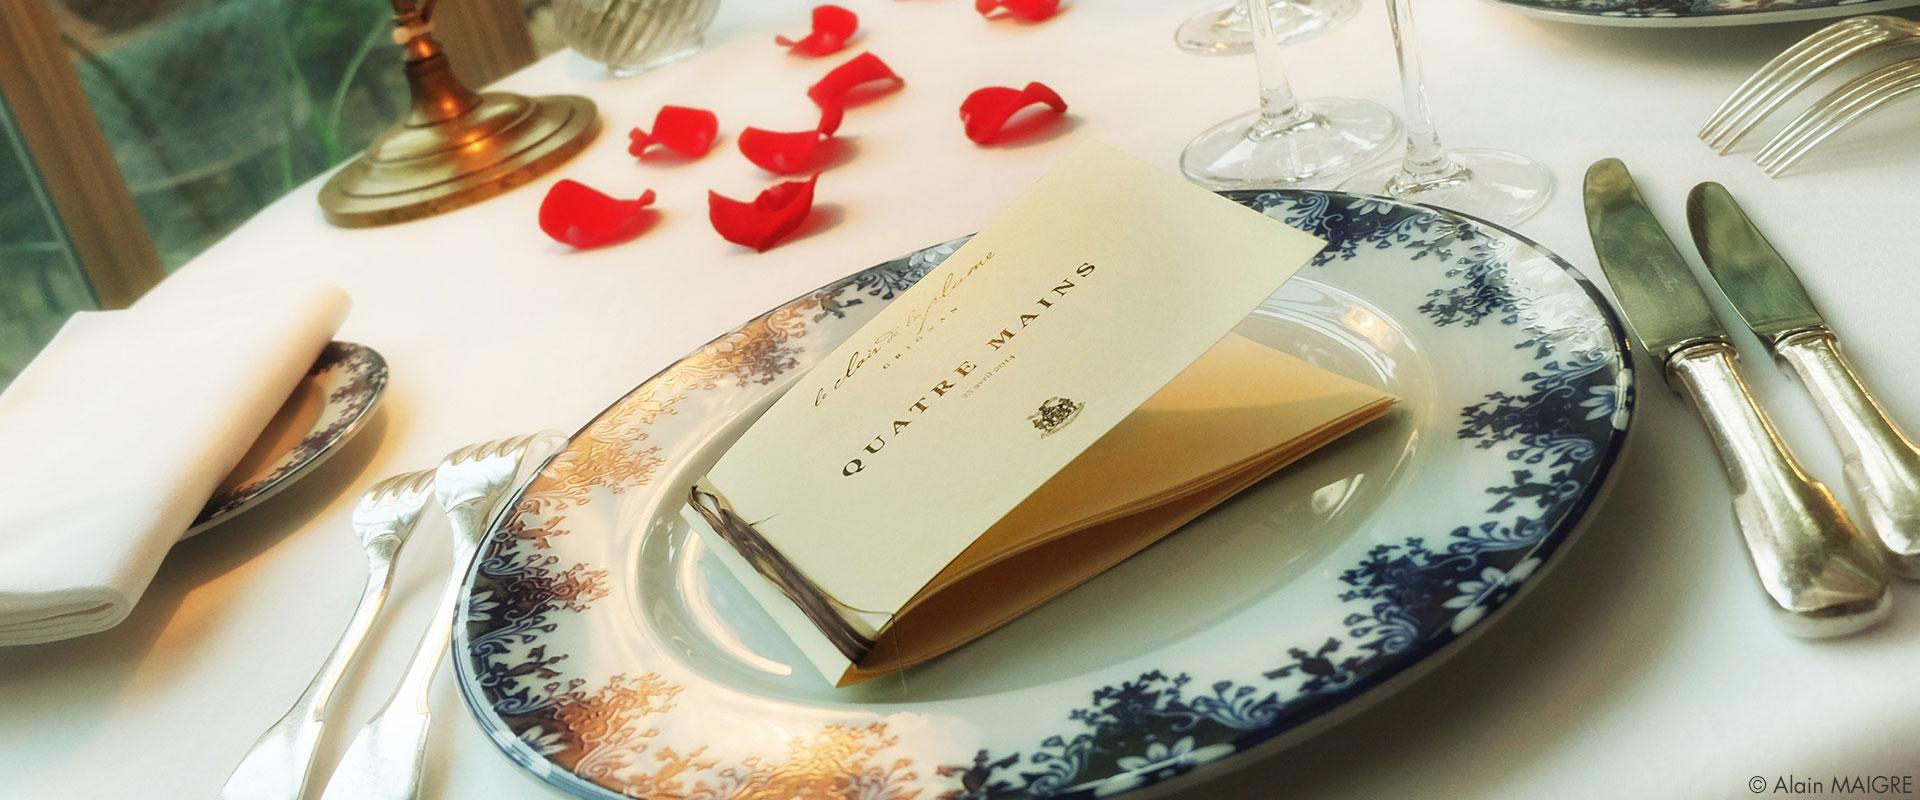 La haute Gastronomie Belge s'invite en France !